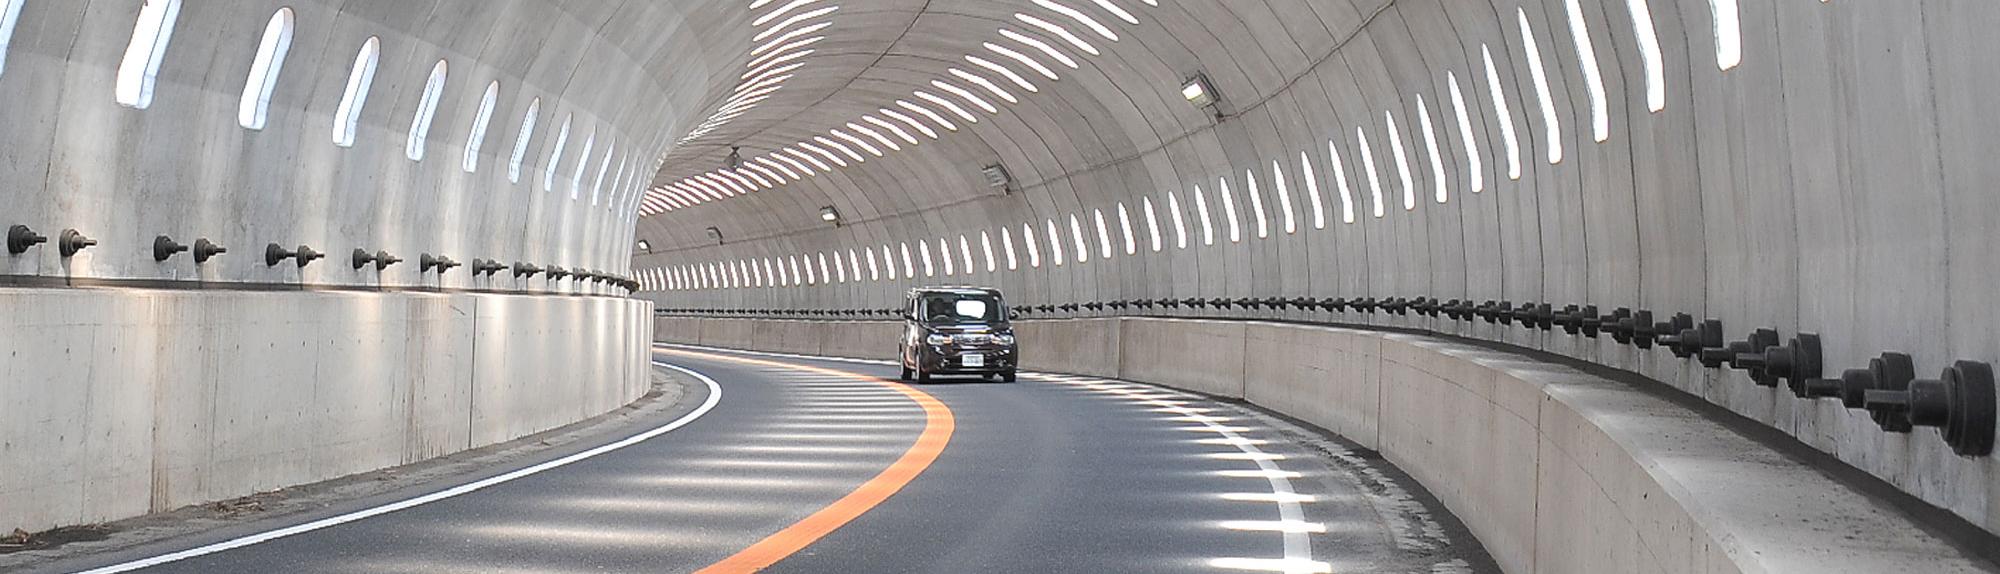 ETC高速道路イメージ